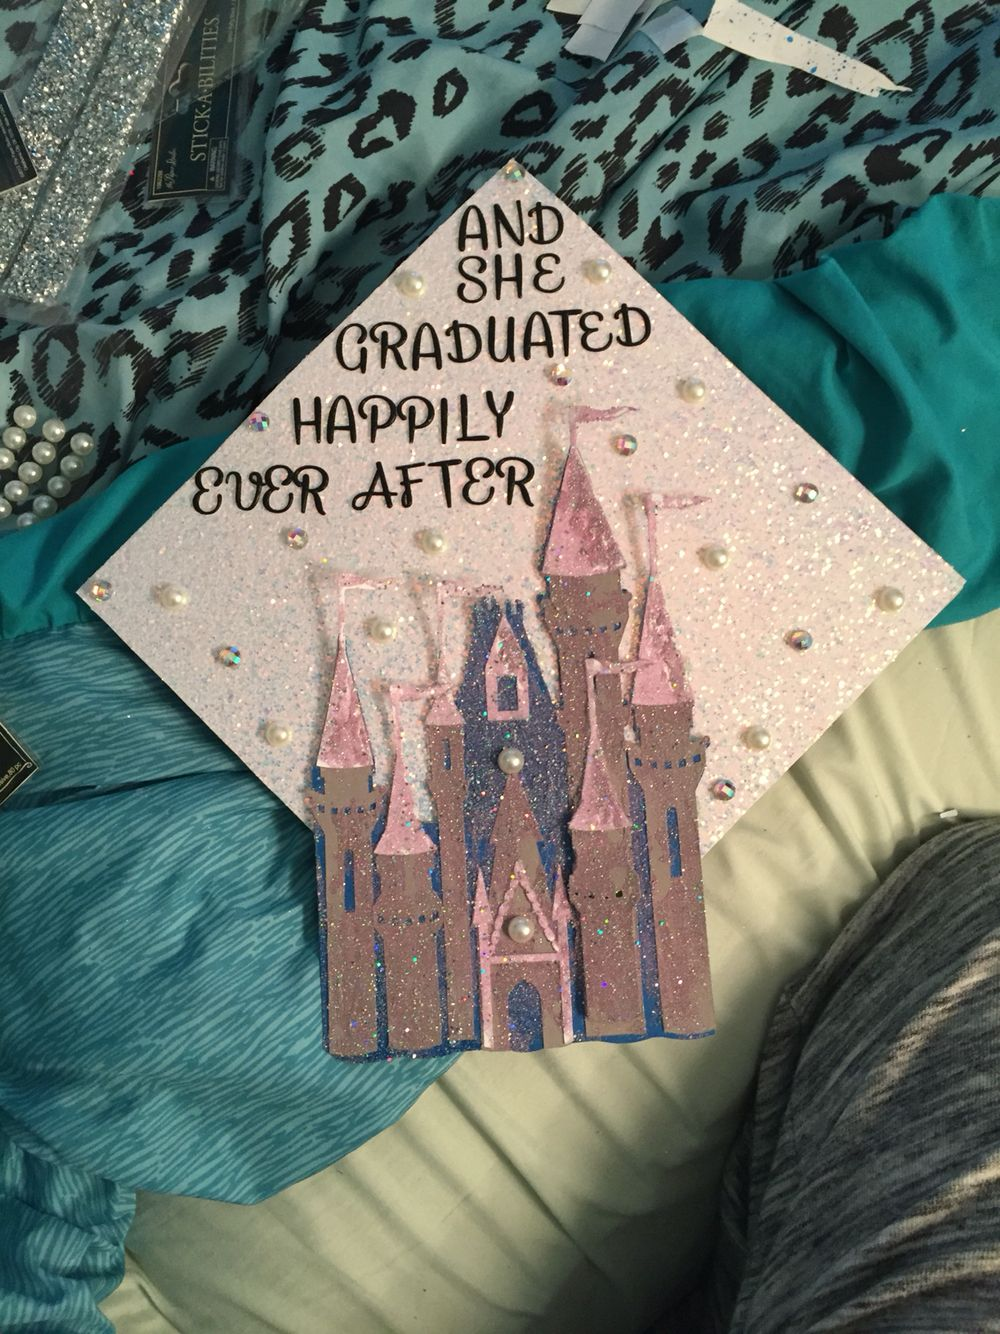 Radiant Cap My Graduation Cap Disney Graduation Cap 2017 Disney Graduation Cap Ideas My Graduation Cap Pricis Graduation Pinterest Grad Banners ideas Disney Graduation Cap